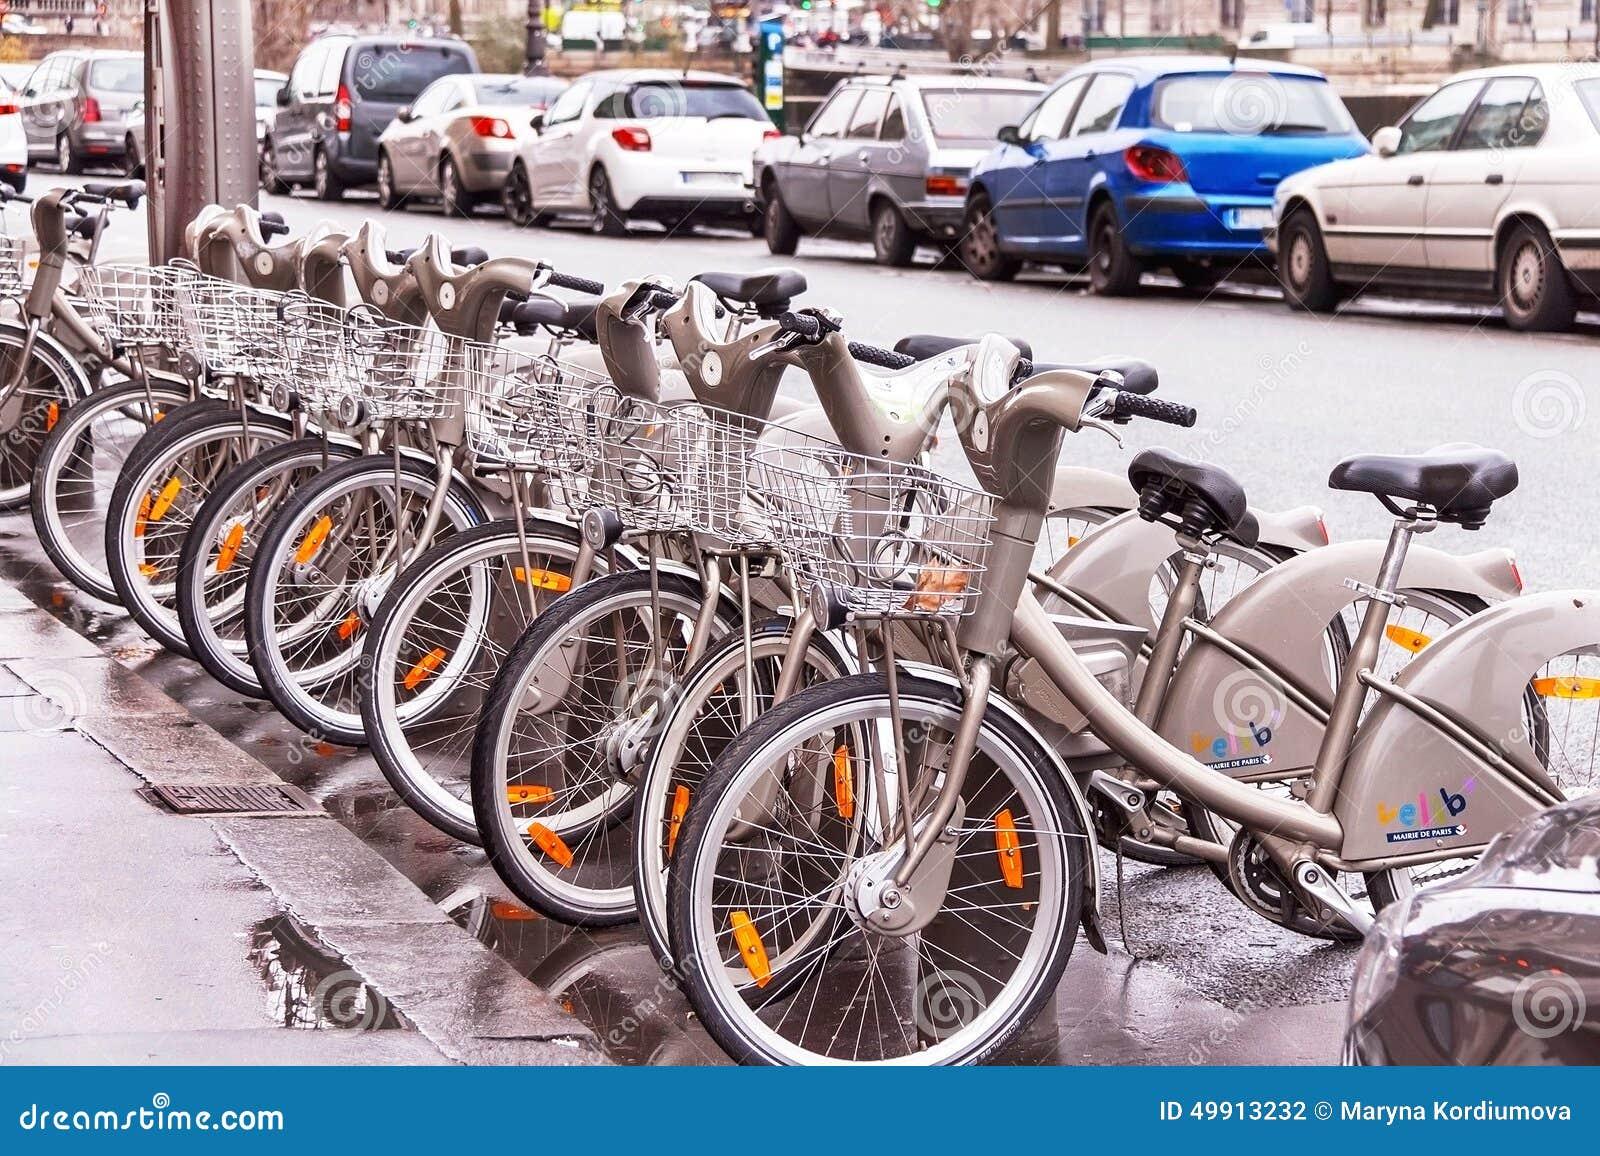 bicycles velib bike rental service in paris france editorial photography image 49913232. Black Bedroom Furniture Sets. Home Design Ideas